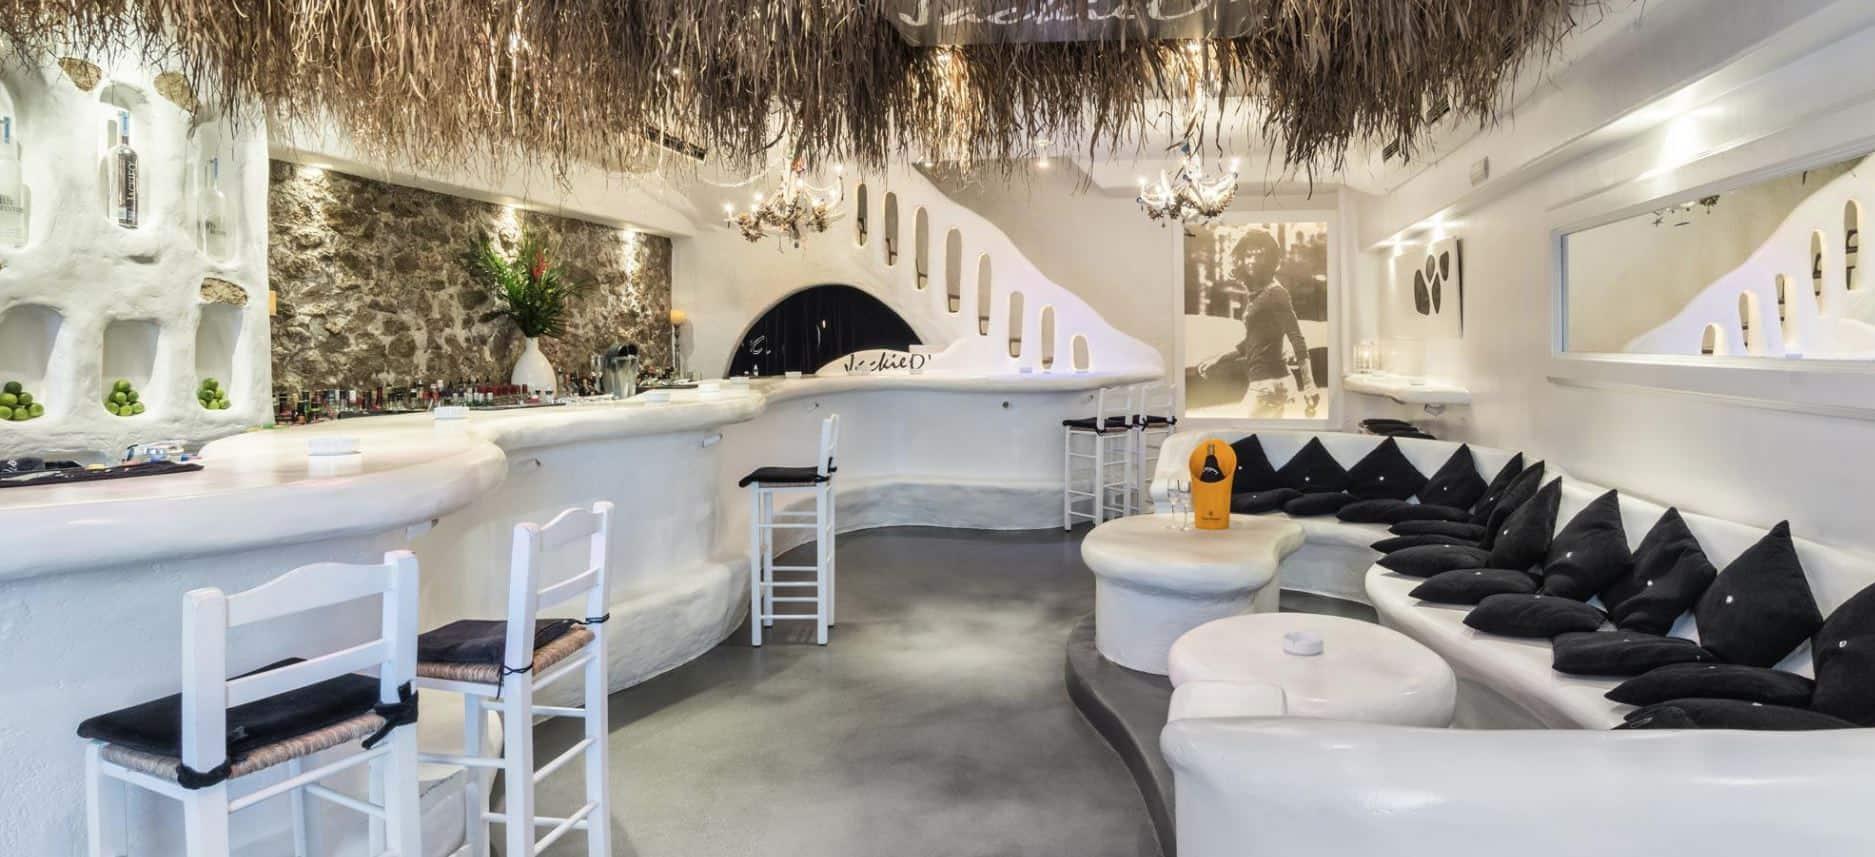 Gay Mykonos · Restaurants